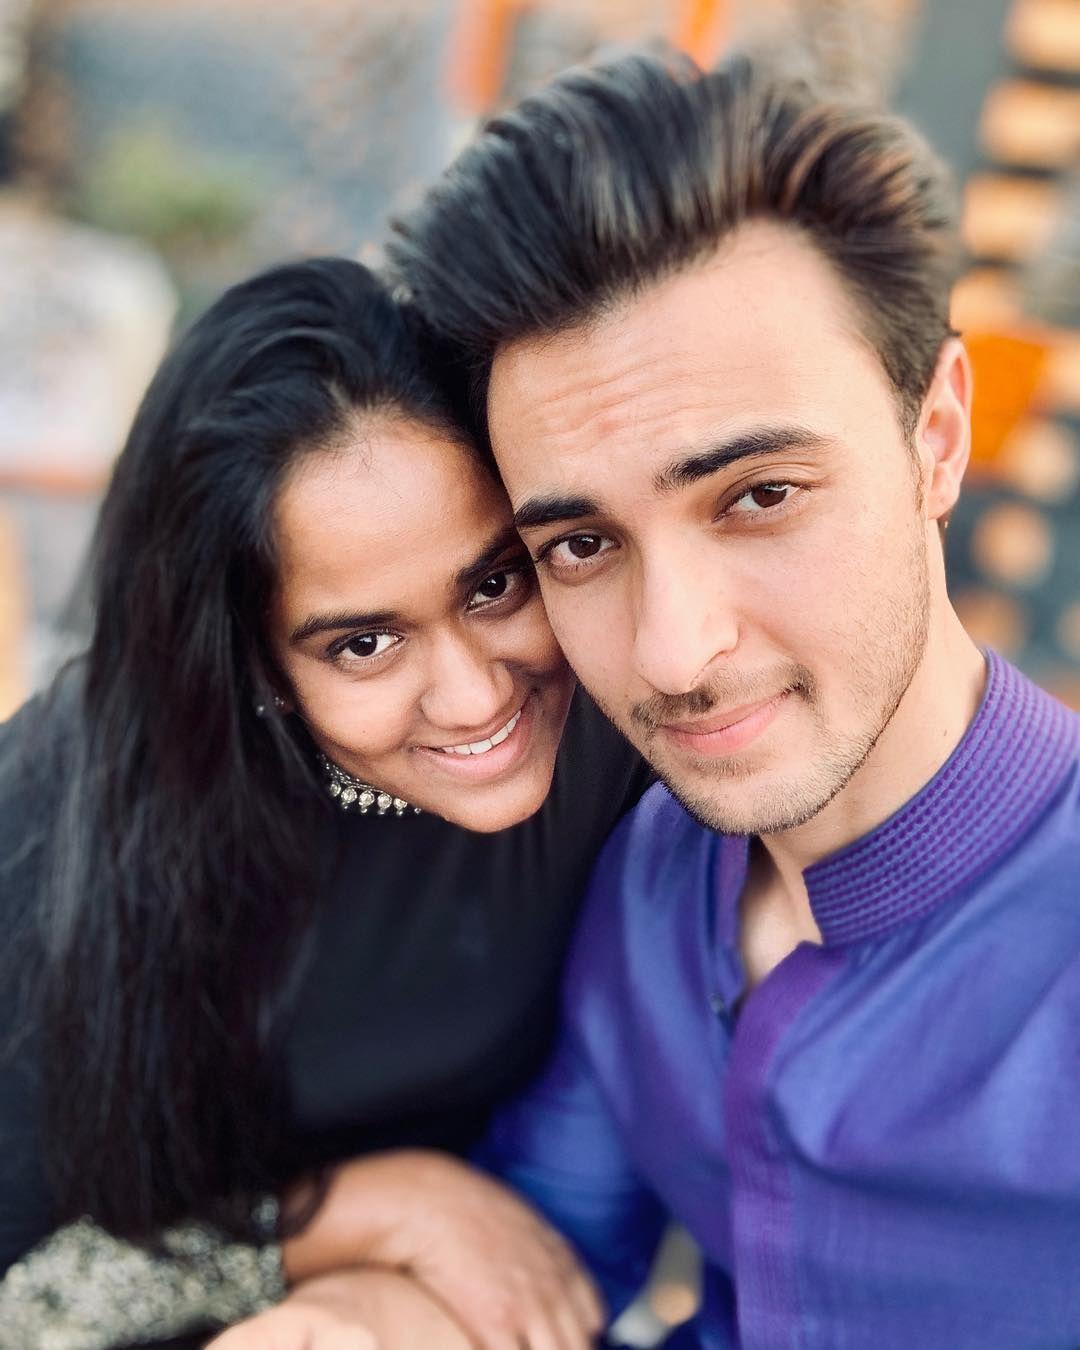 Arpita Khan Sharma and Aayush Sharma are celebrating four